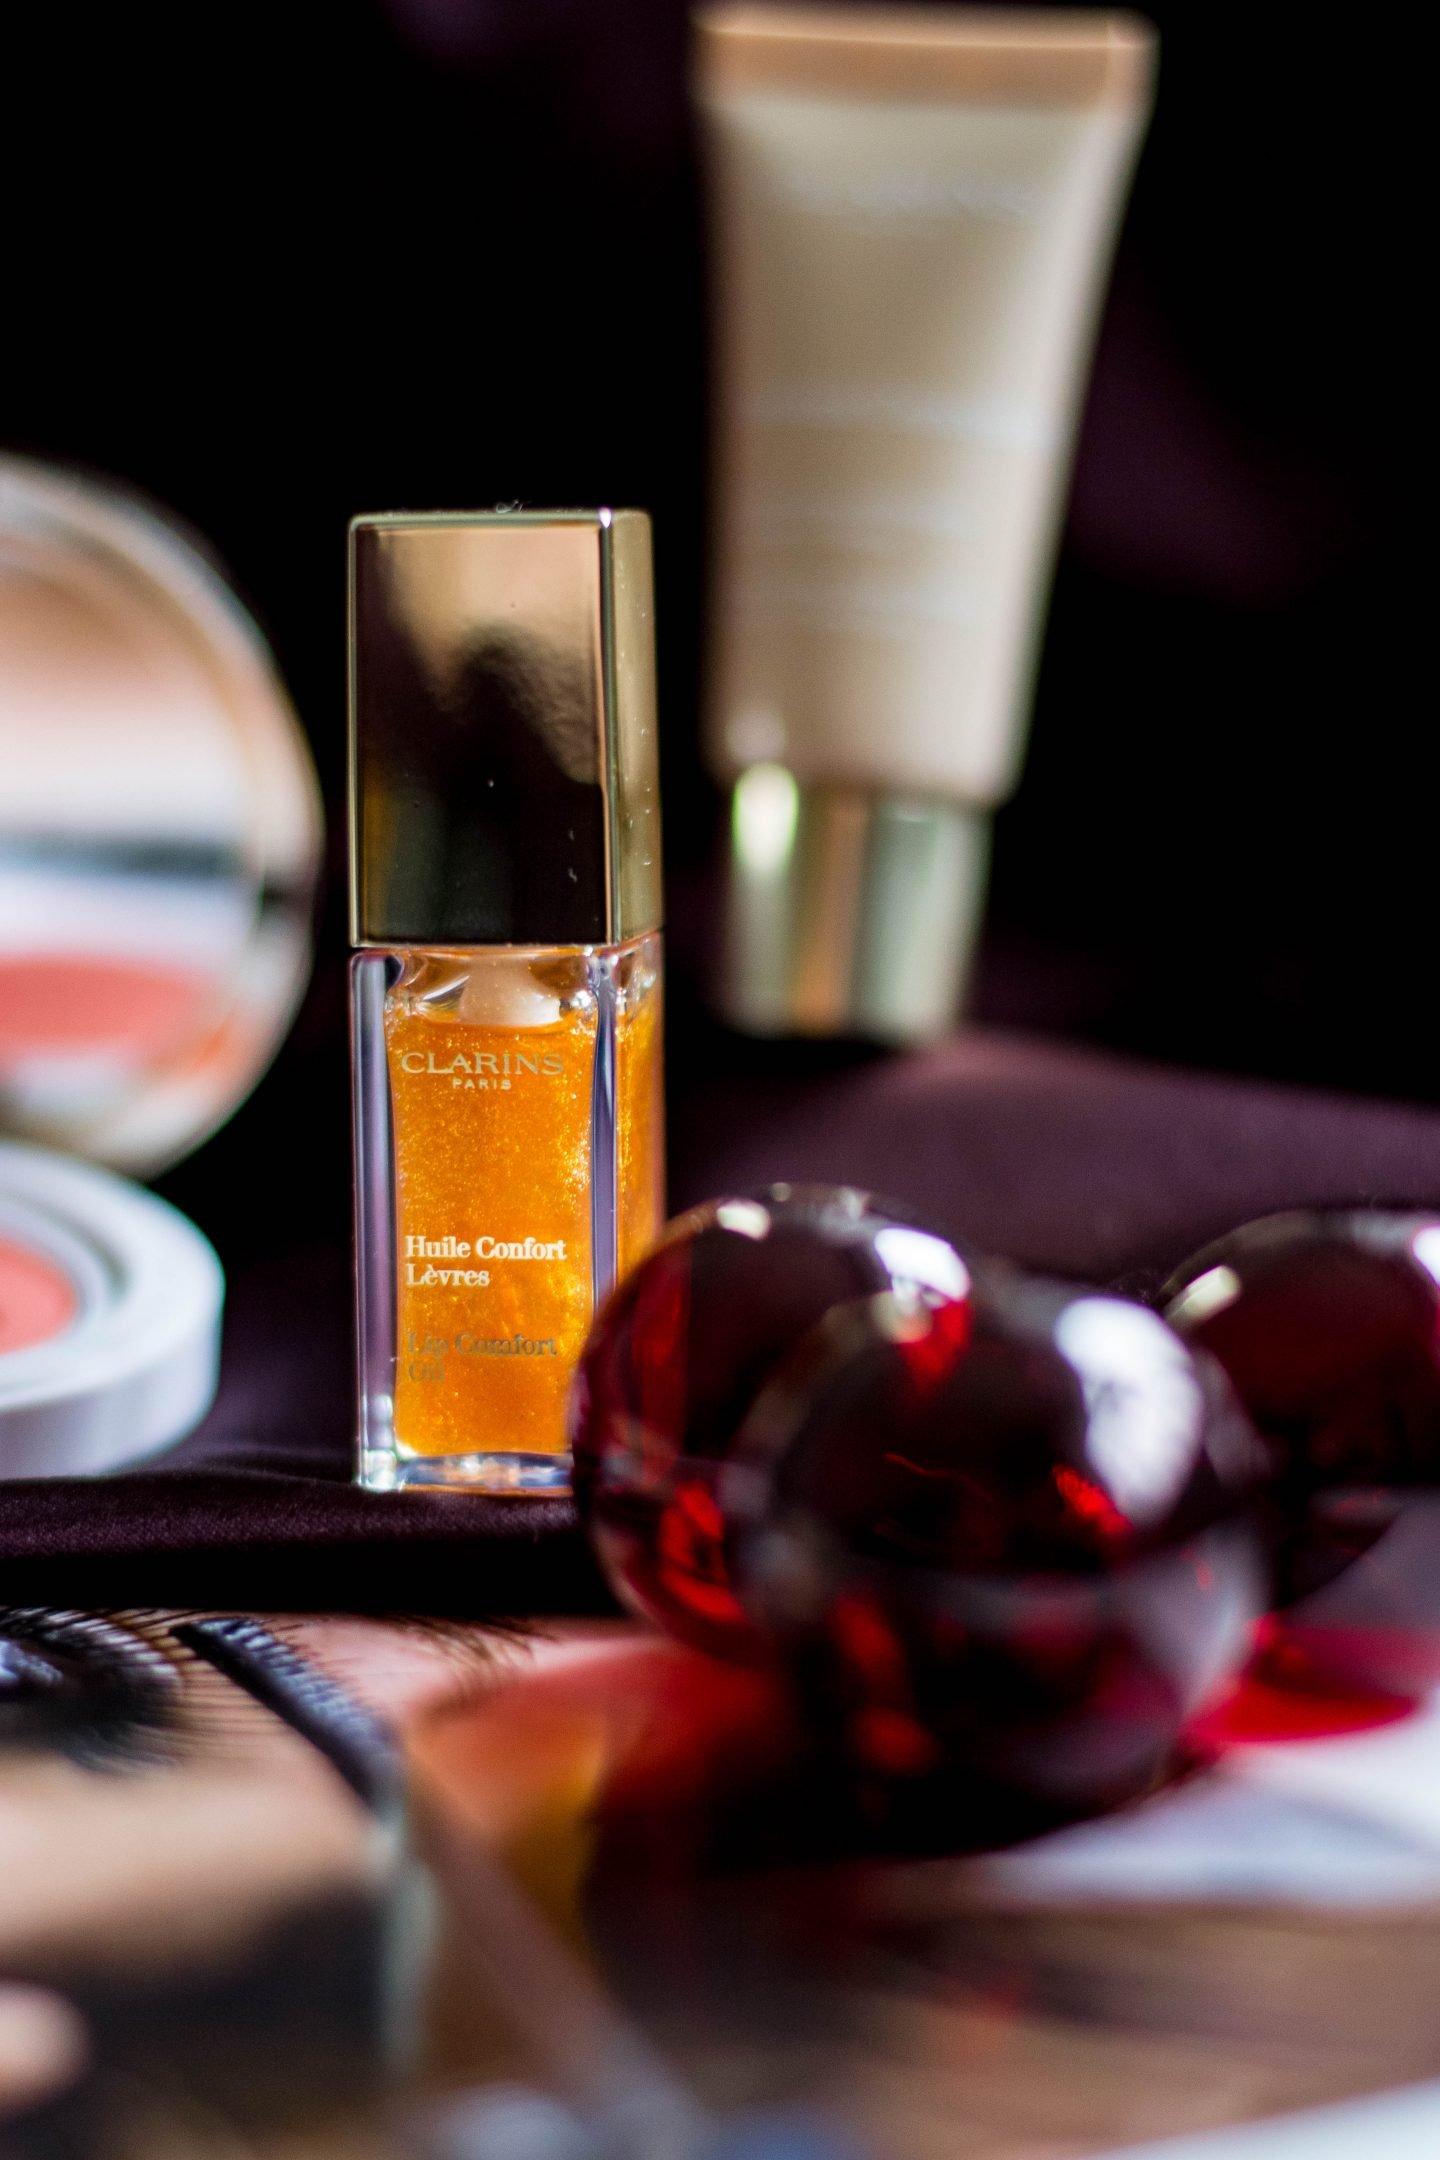 Clarins, Huile Confort Lèvres, Lippenöl, Honey Glam, Pflege, Glanz, Strahlen, Leuchten, Lipgloss, Pimp your lipstick, 3 in 1 Lippenprodukt,